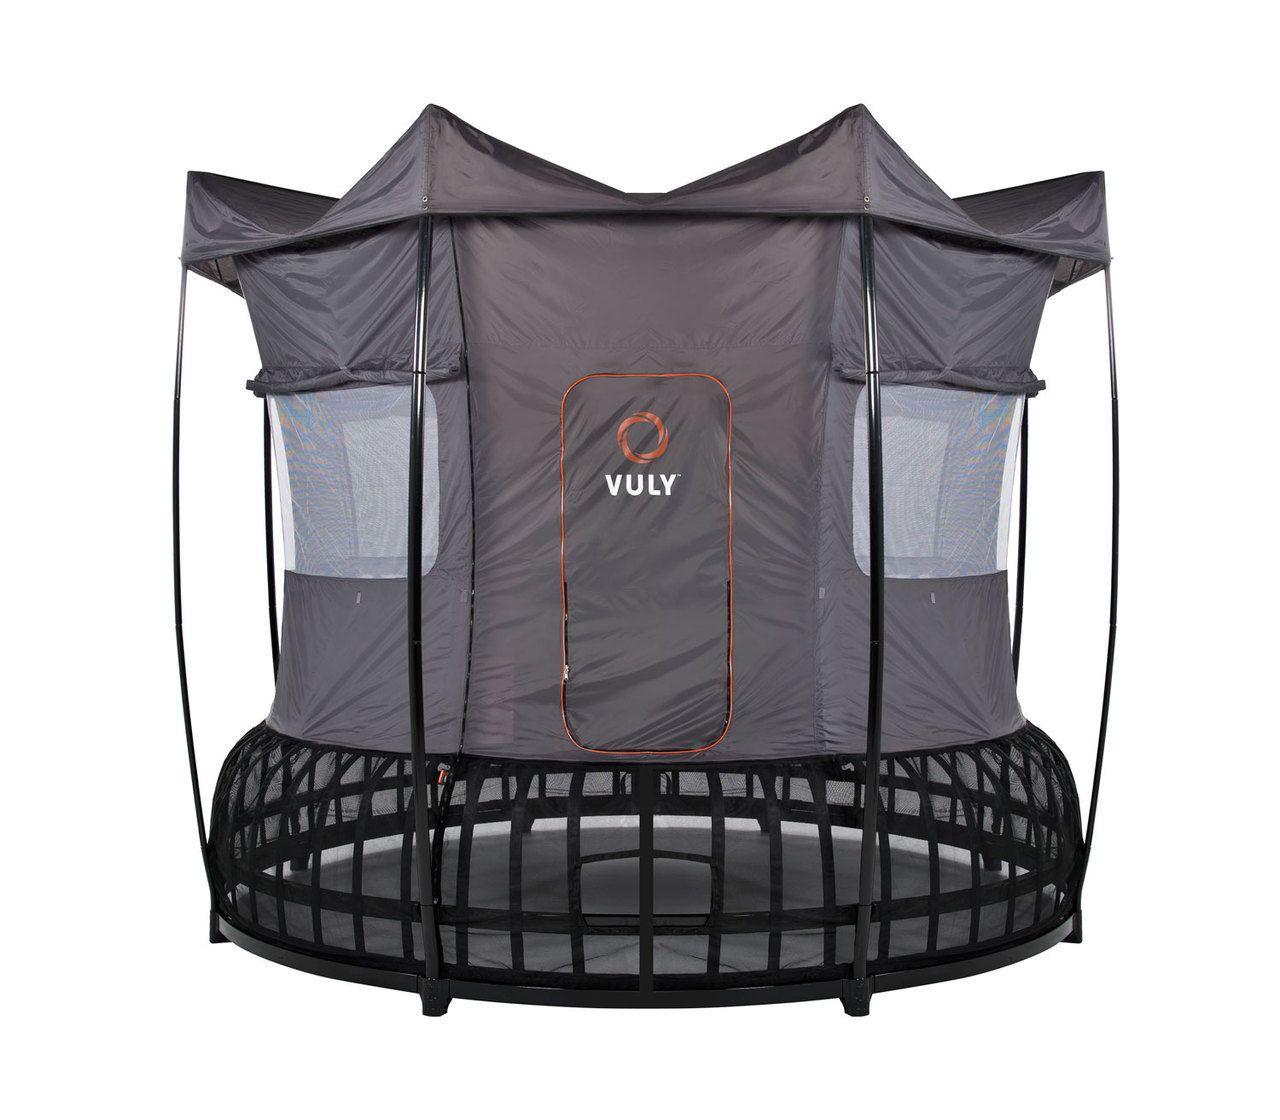 Vuly Thunder Trampoline Tent - Large